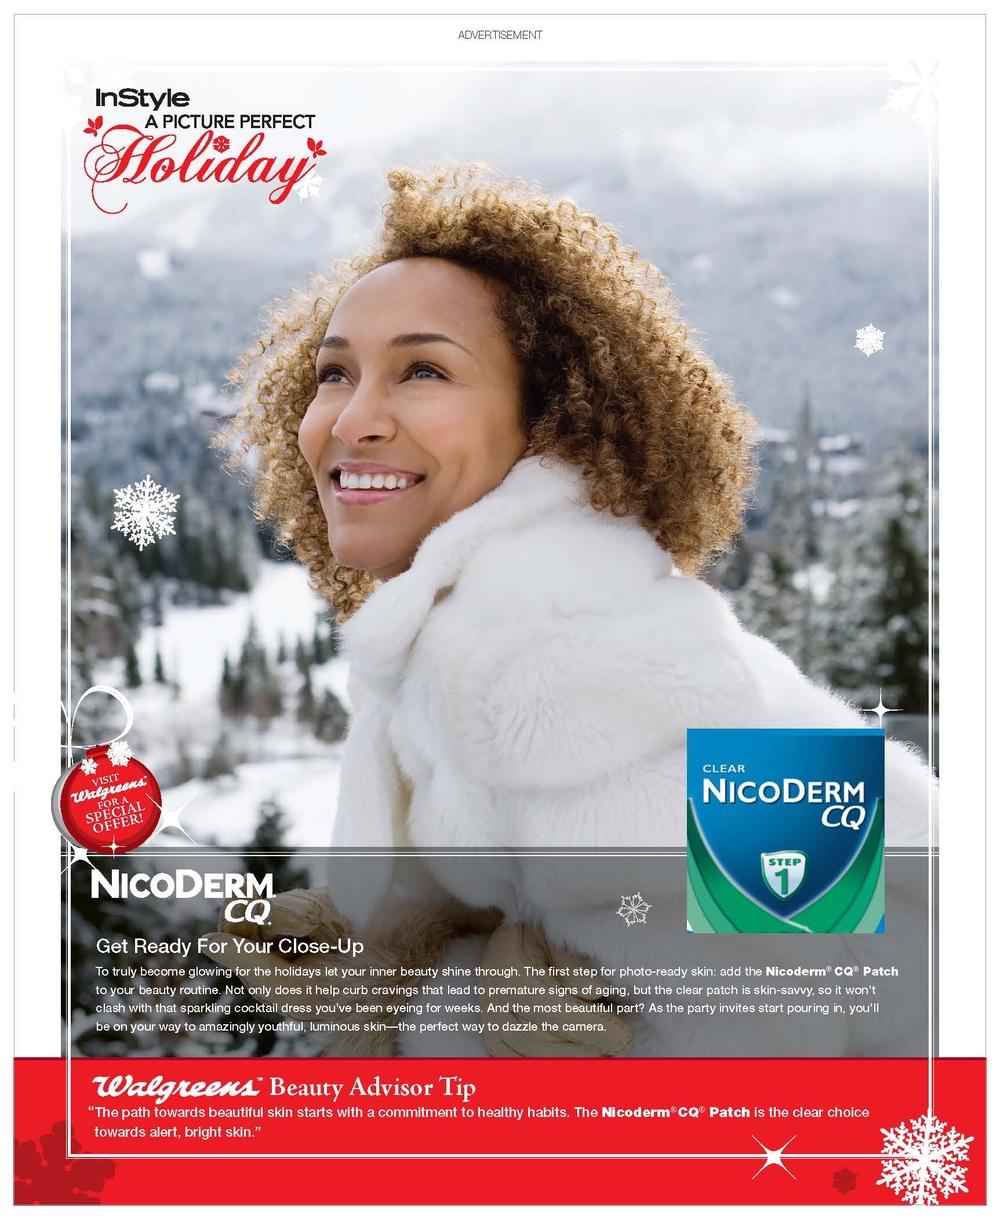 Walgreens: Nicoderm